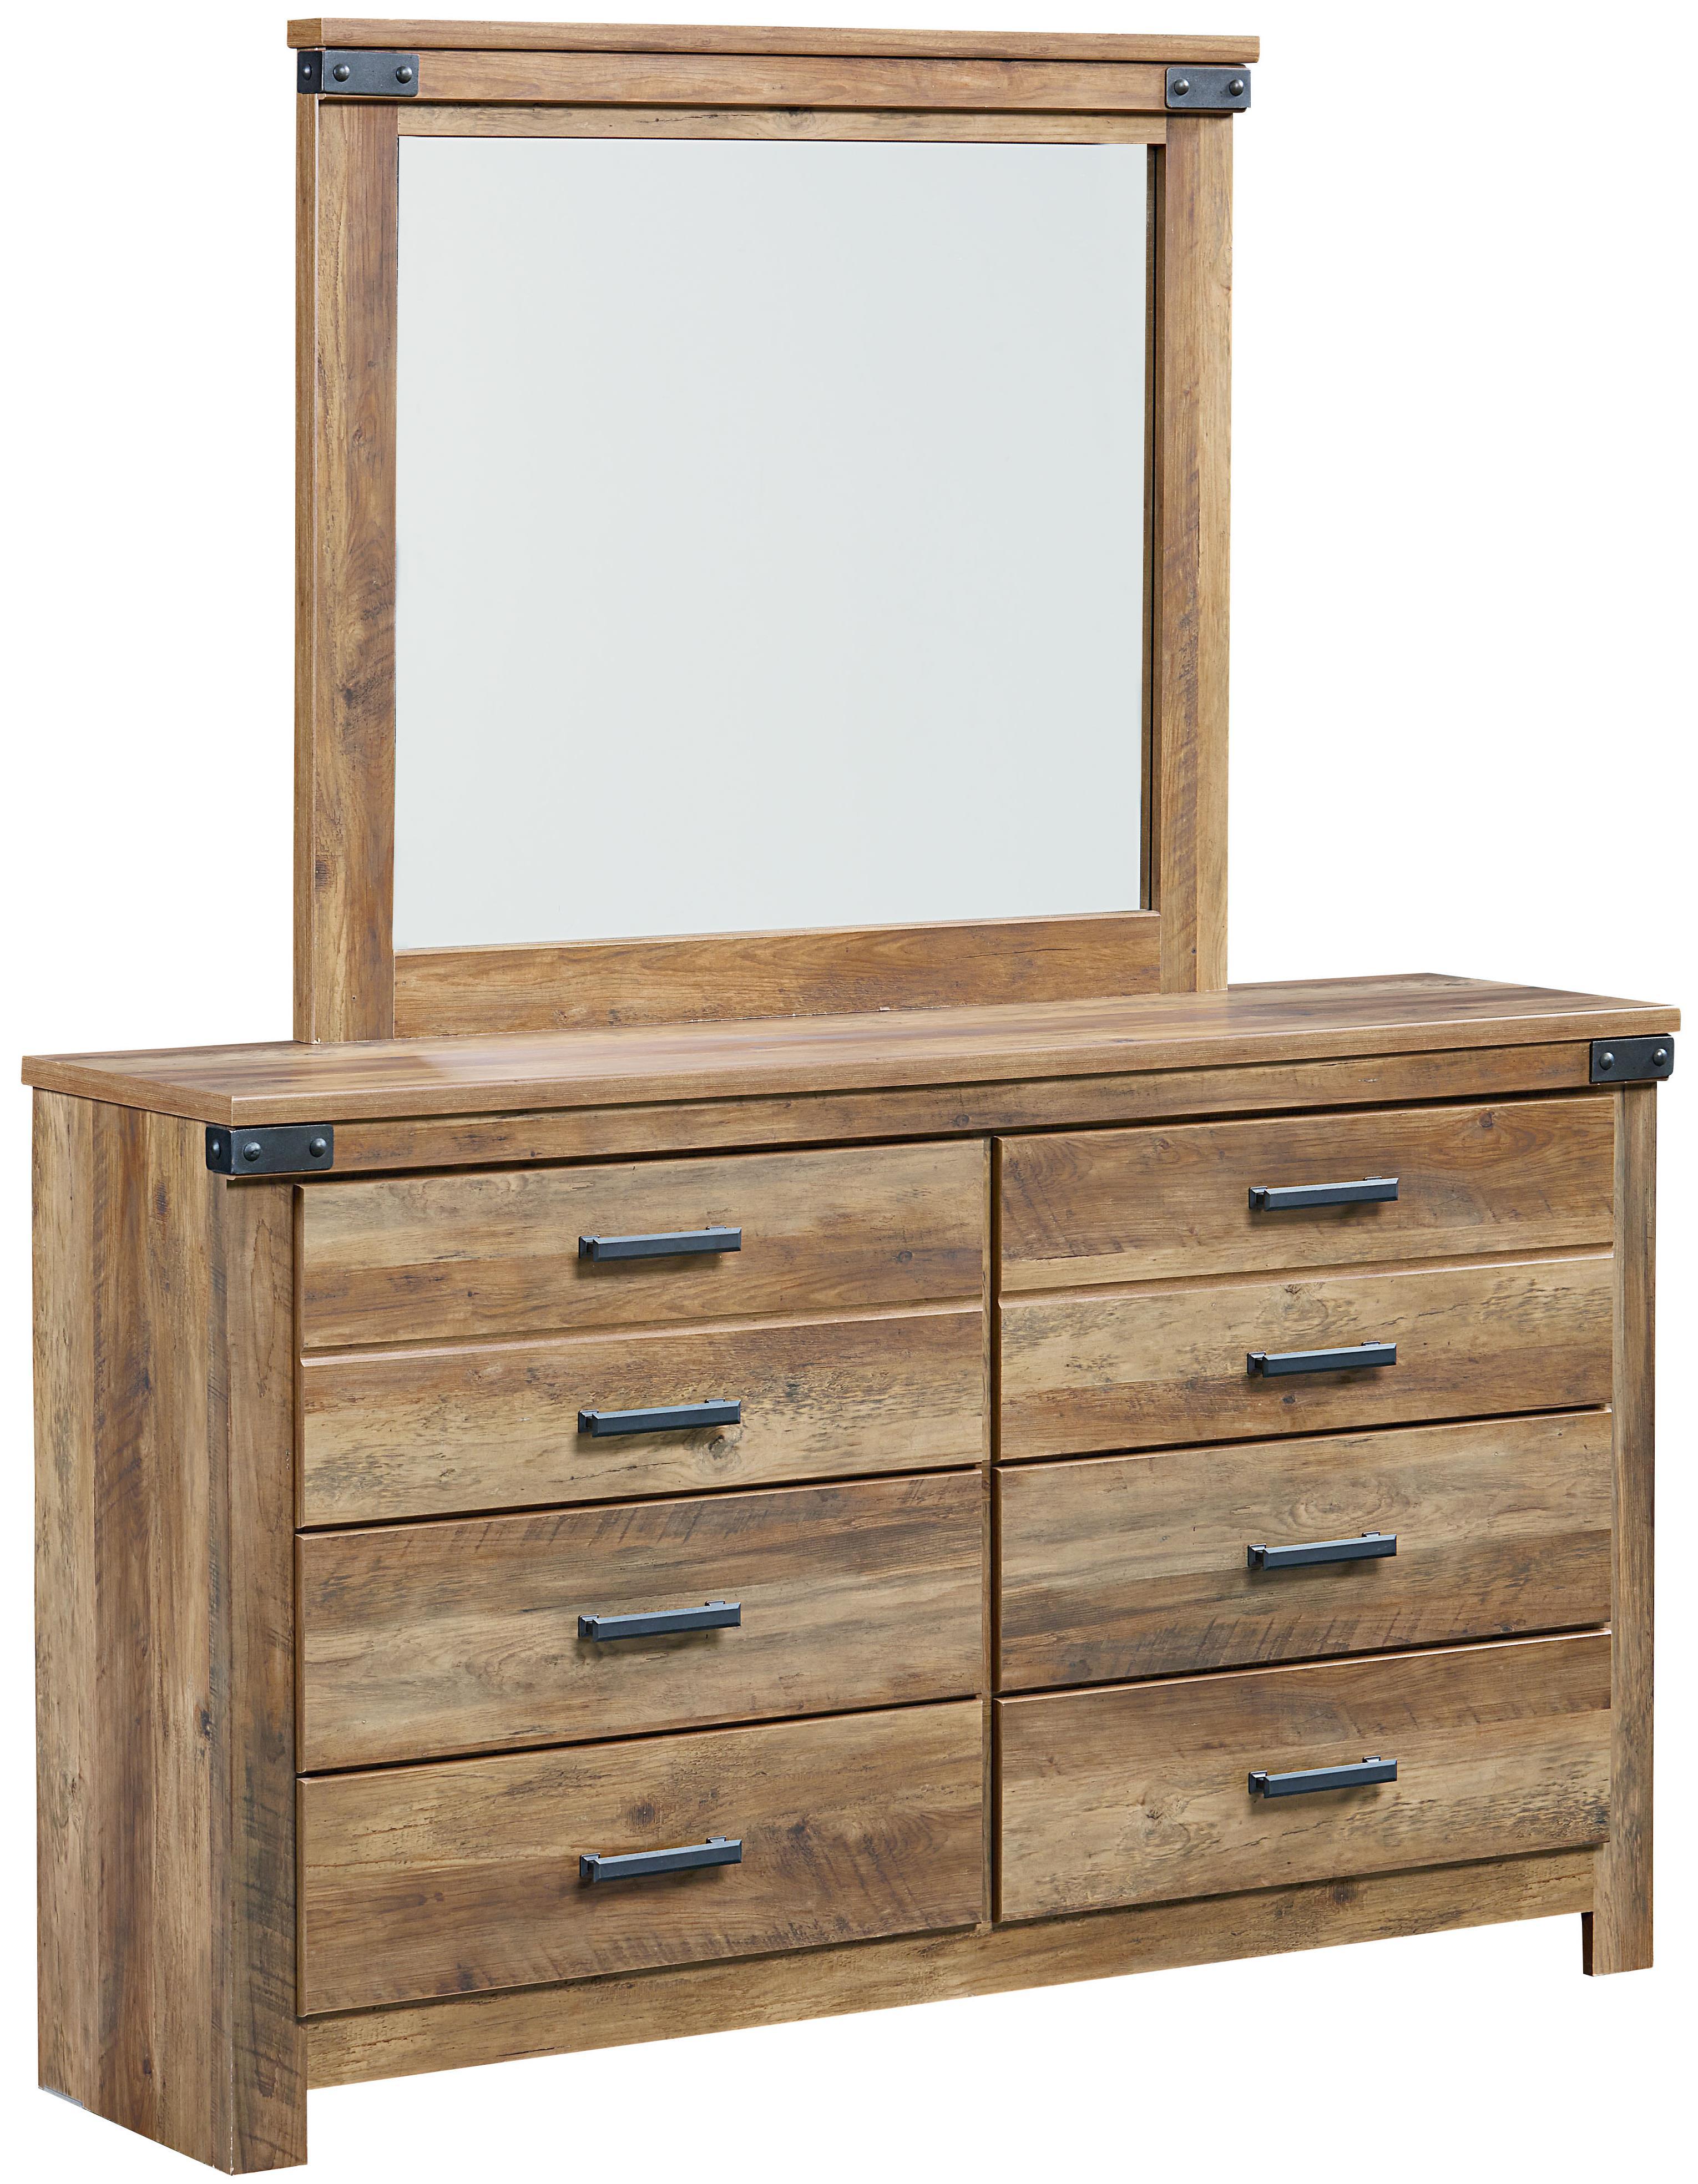 Standard Furniture Montana Dresser + Mirror - Item Number: 52459+68